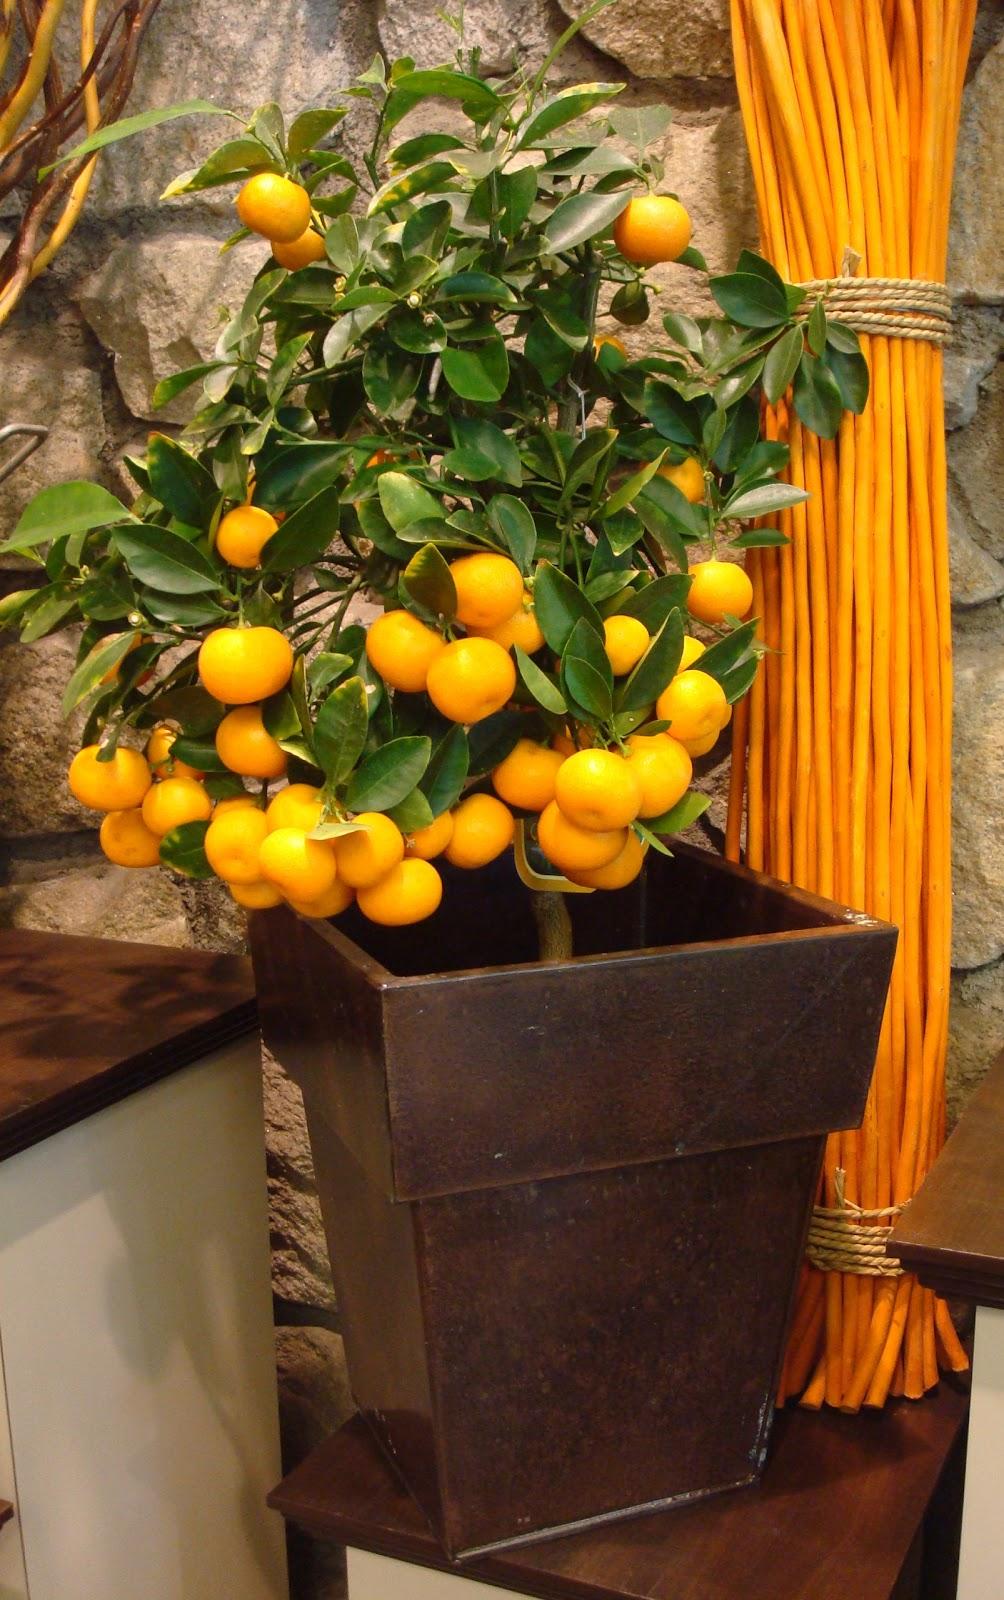 fleuriste isabelle feuvrier le cl mentinier mandarinier ou oranger. Black Bedroom Furniture Sets. Home Design Ideas